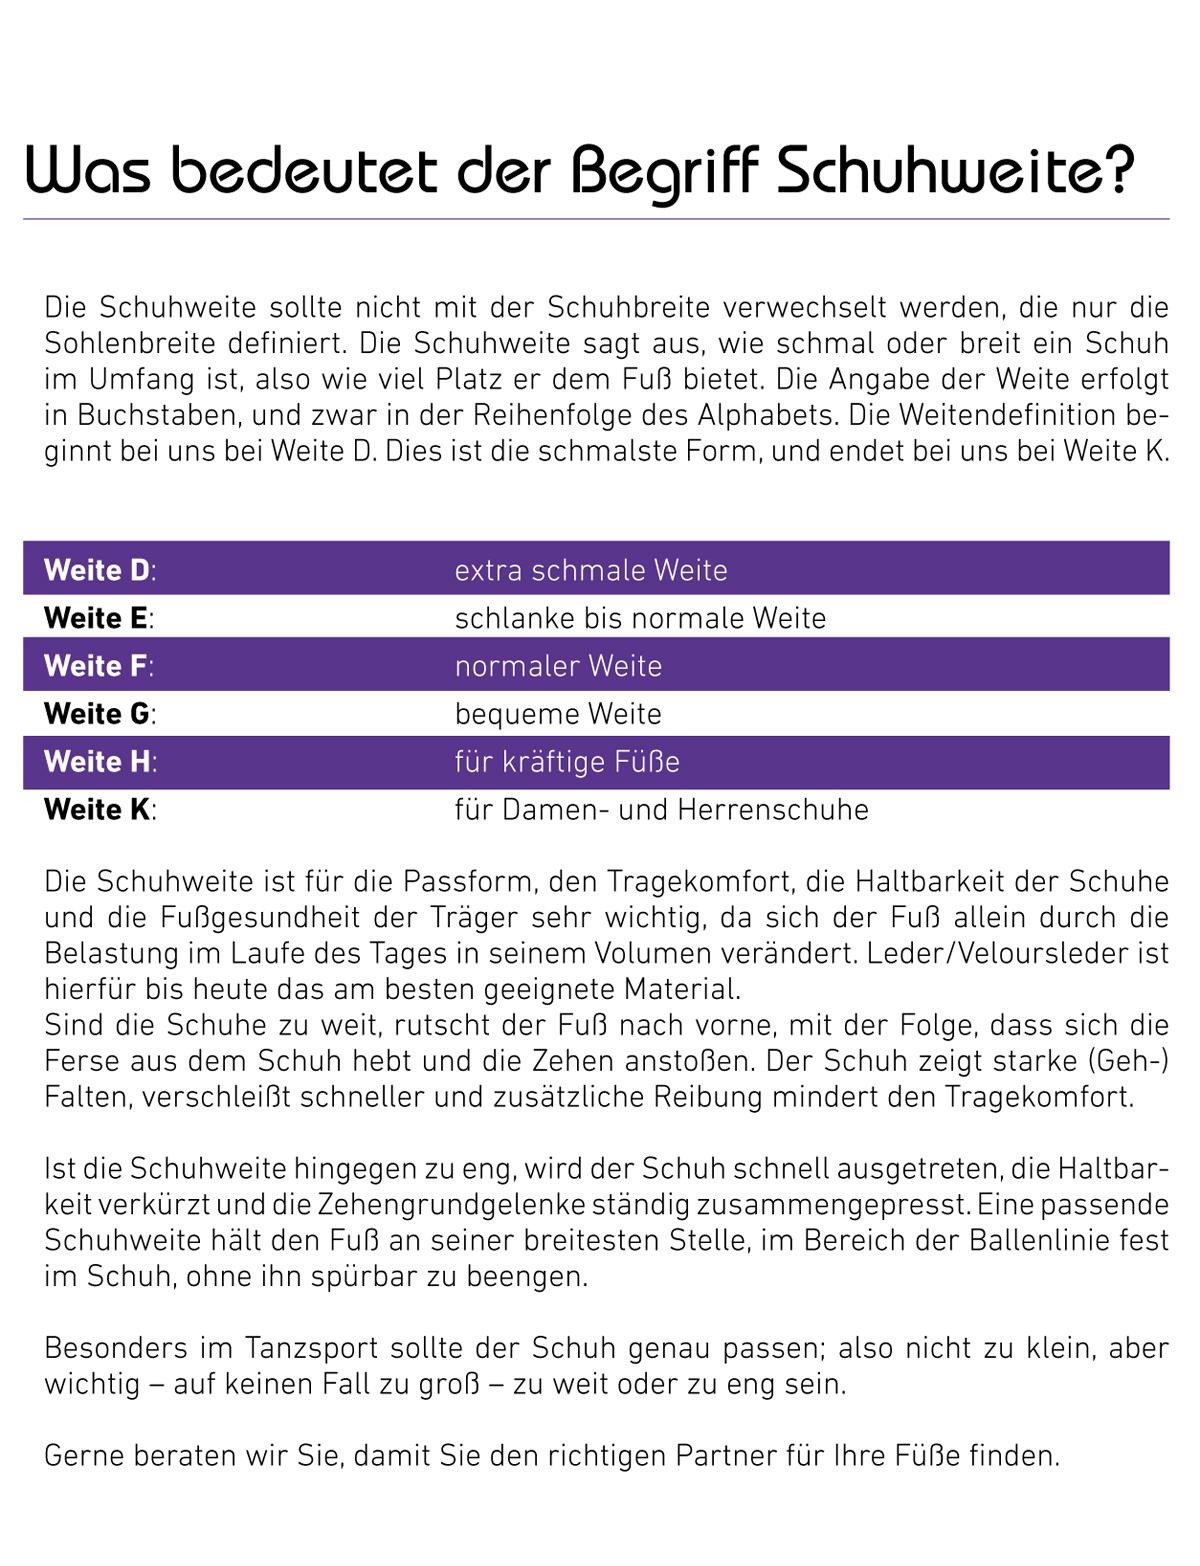 RZ_Katalog_Top_Tanz_2019_web_einzel-43